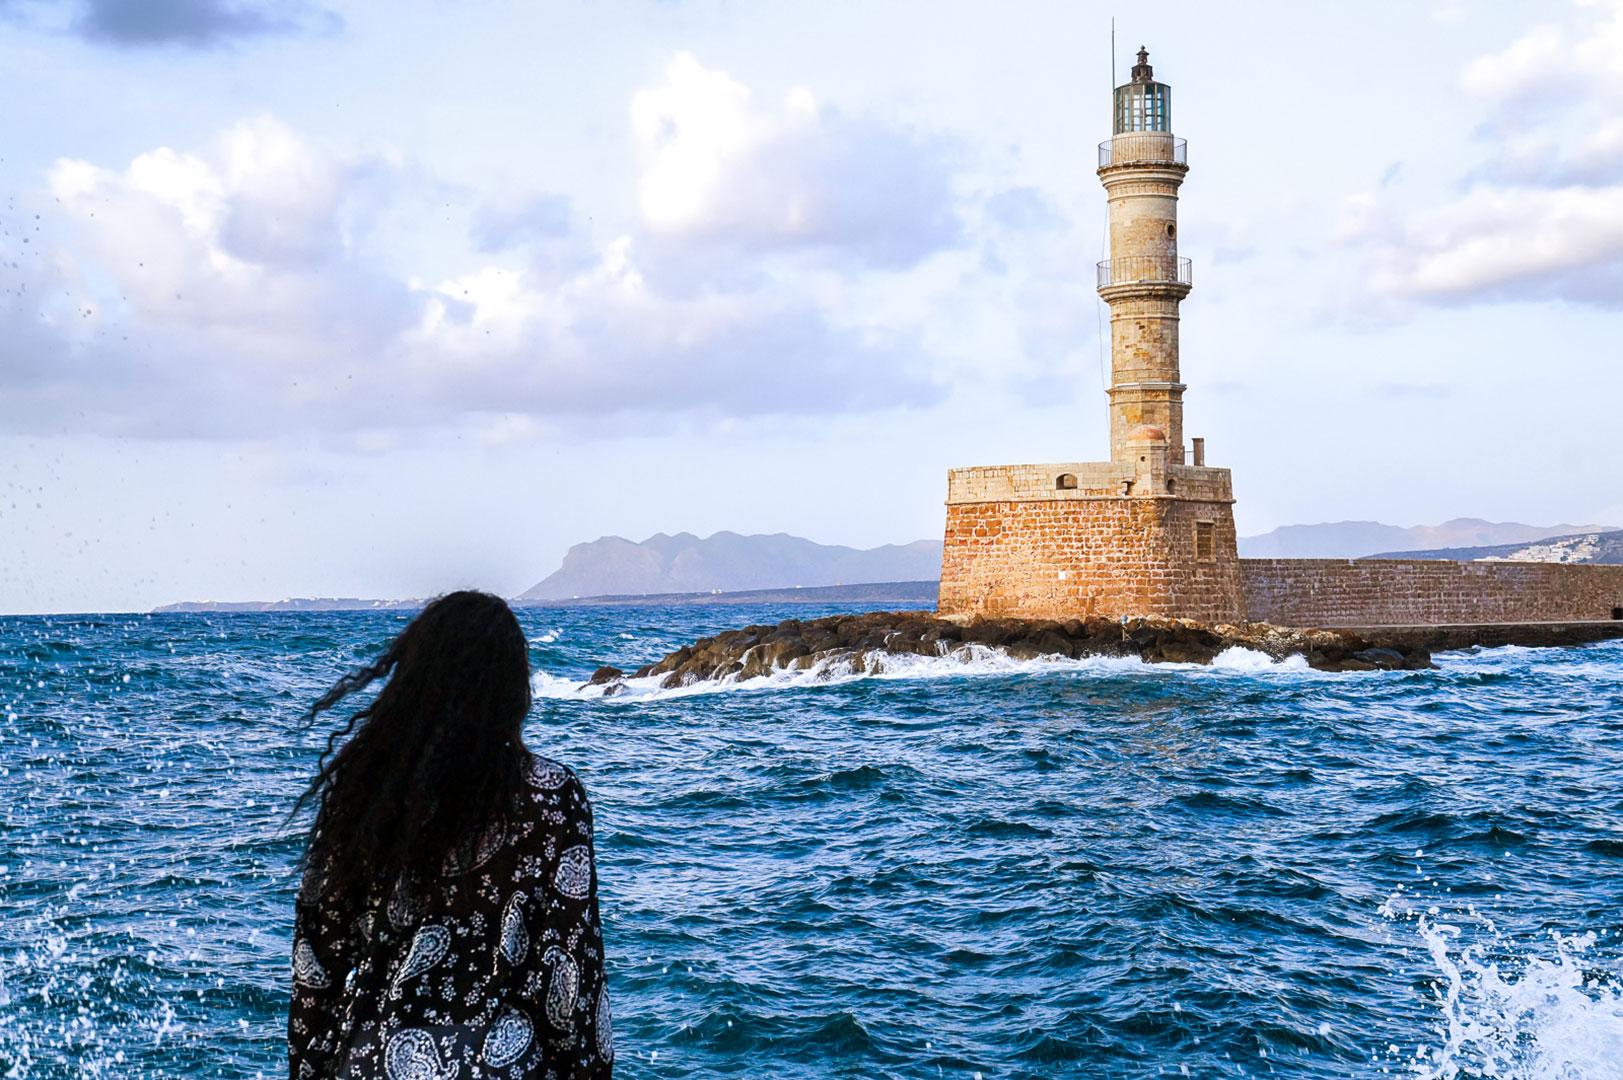 chania-crete-greece-la-vie-en-blog-all-rights-reserved-11